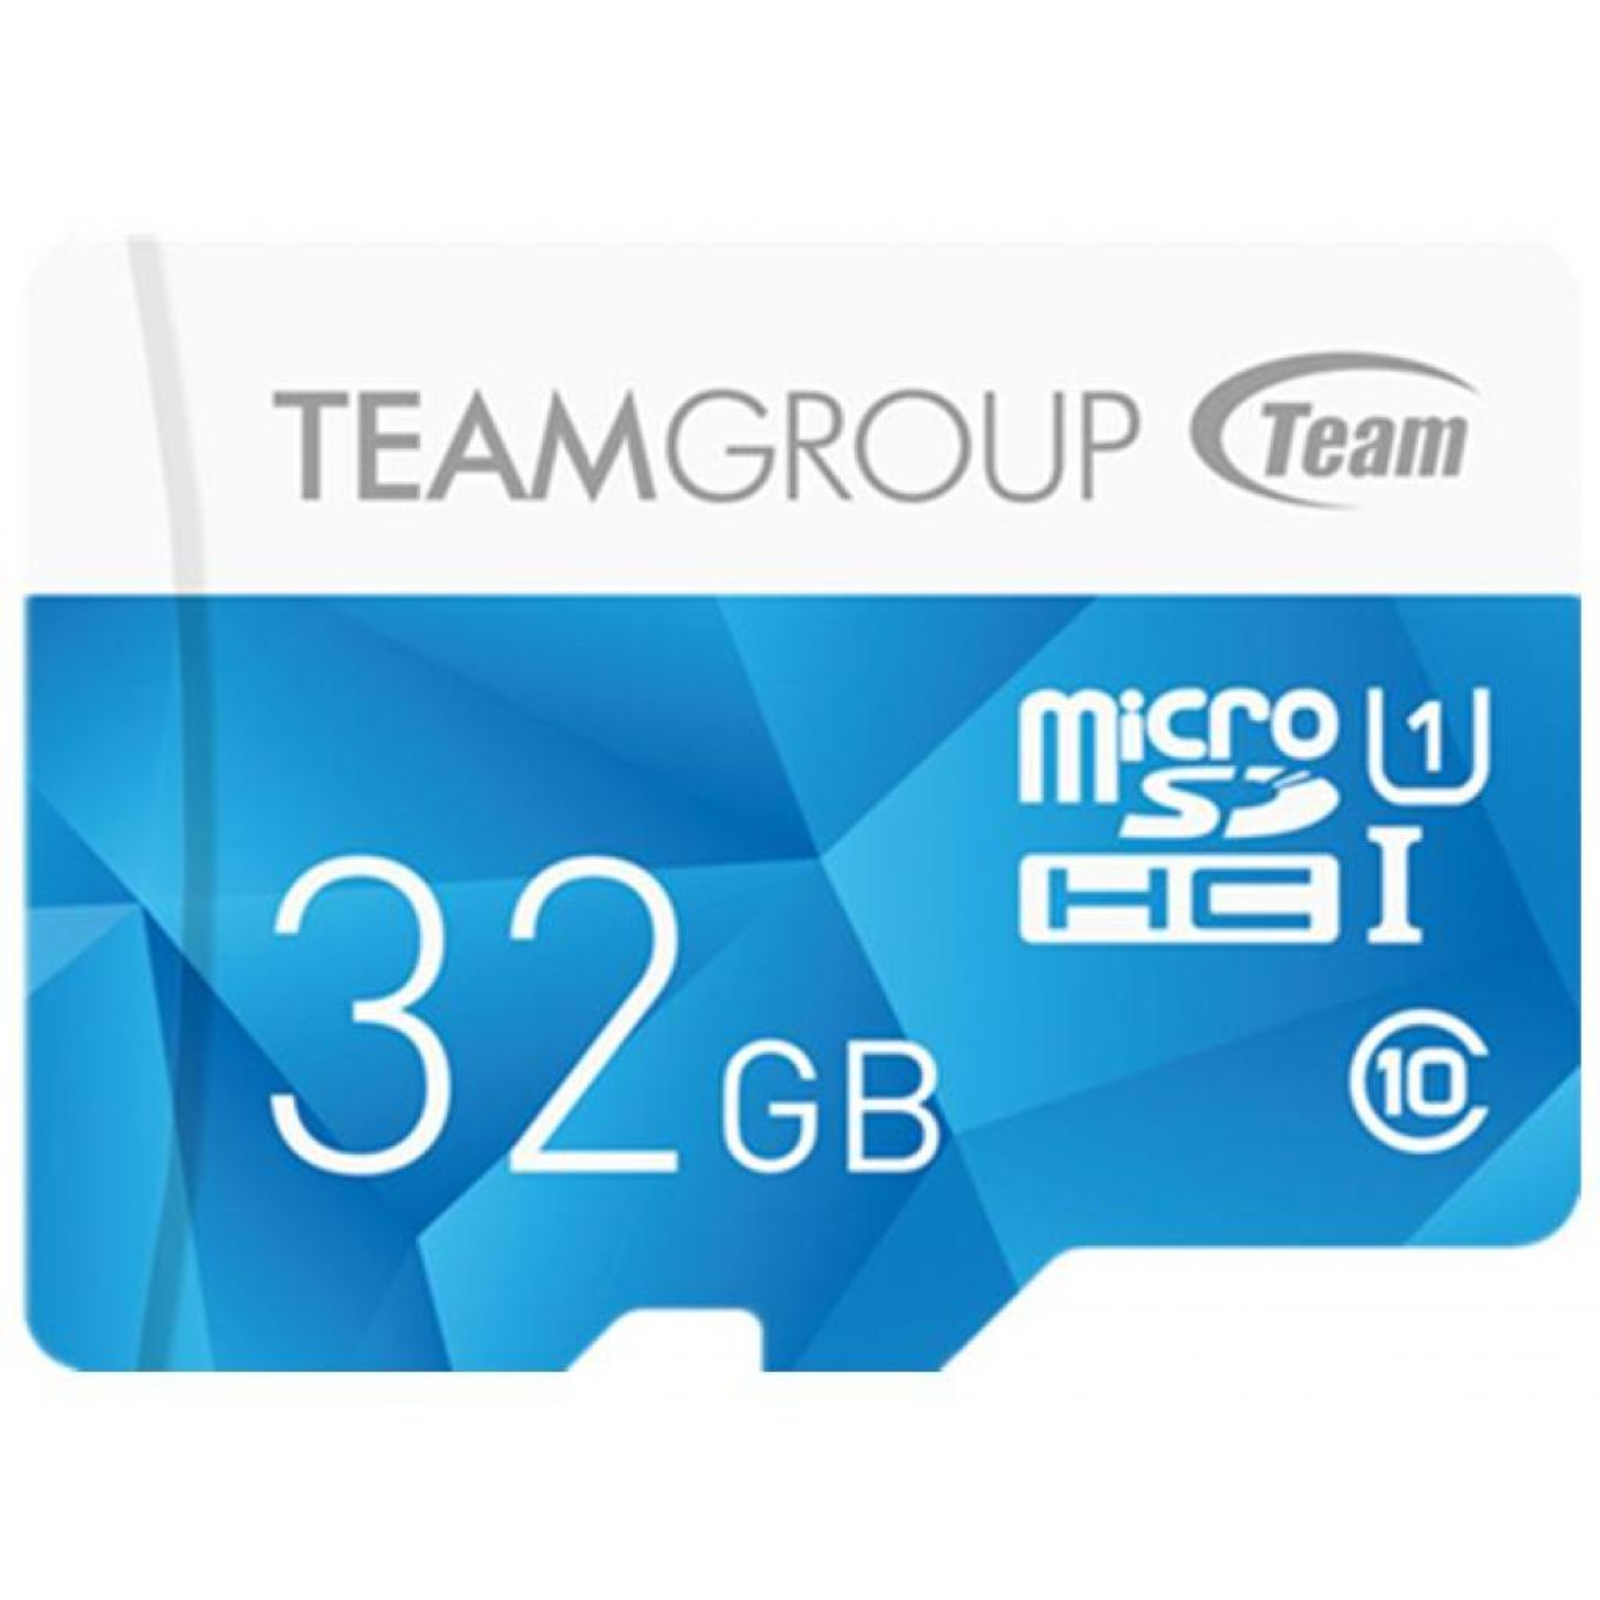 Карта памяти Team 32GB microSD class 10 UHS-I (TCUSDH32GUHS40) изображение 2